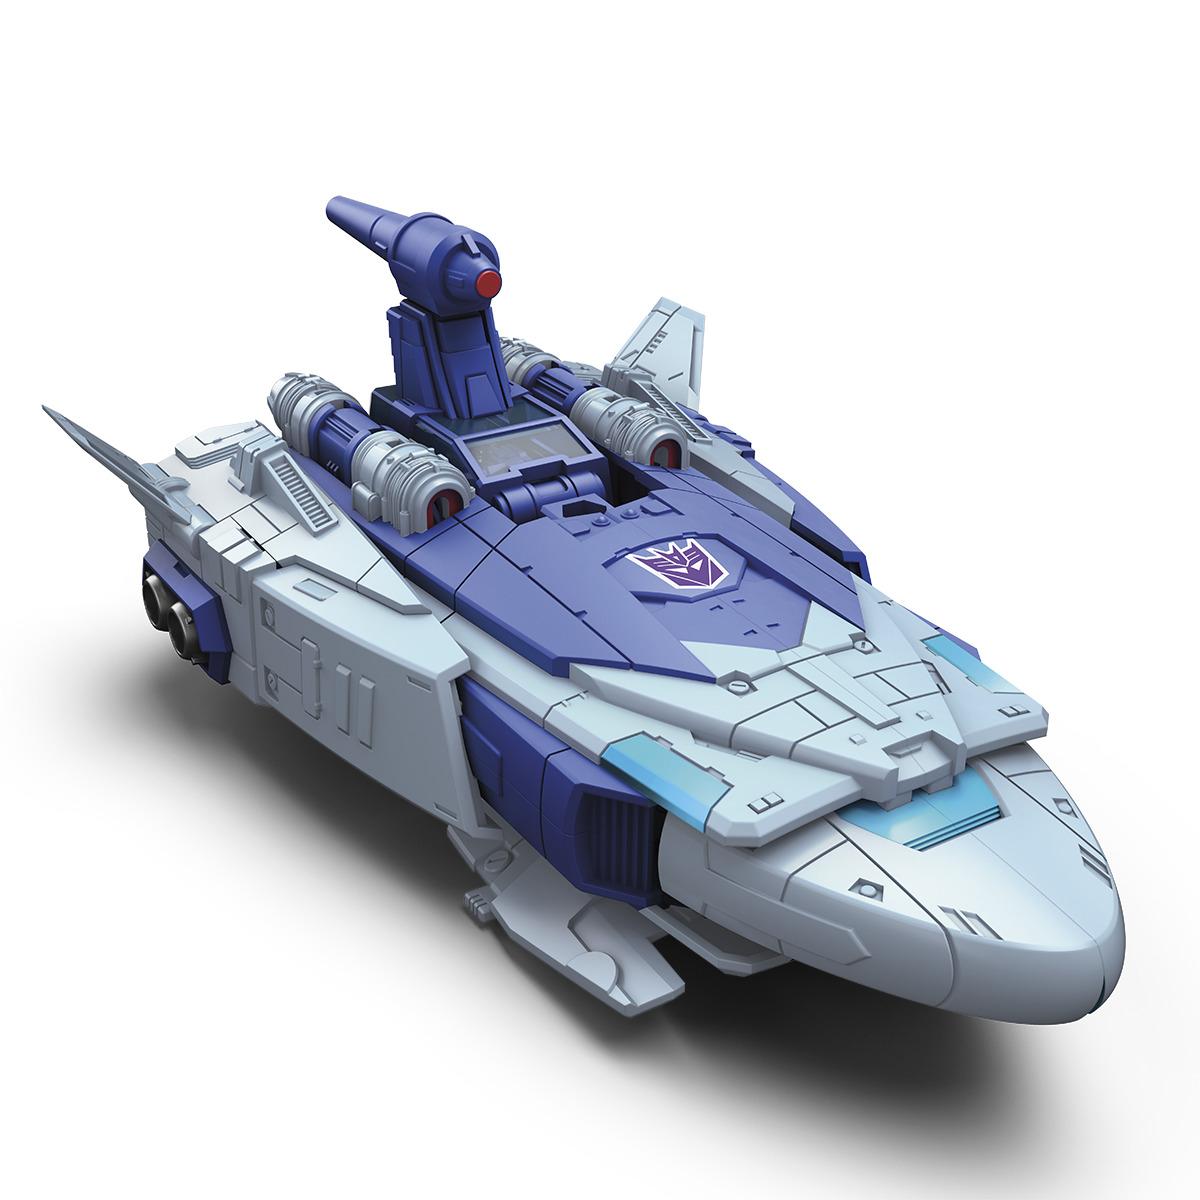 Scourge Spaceship